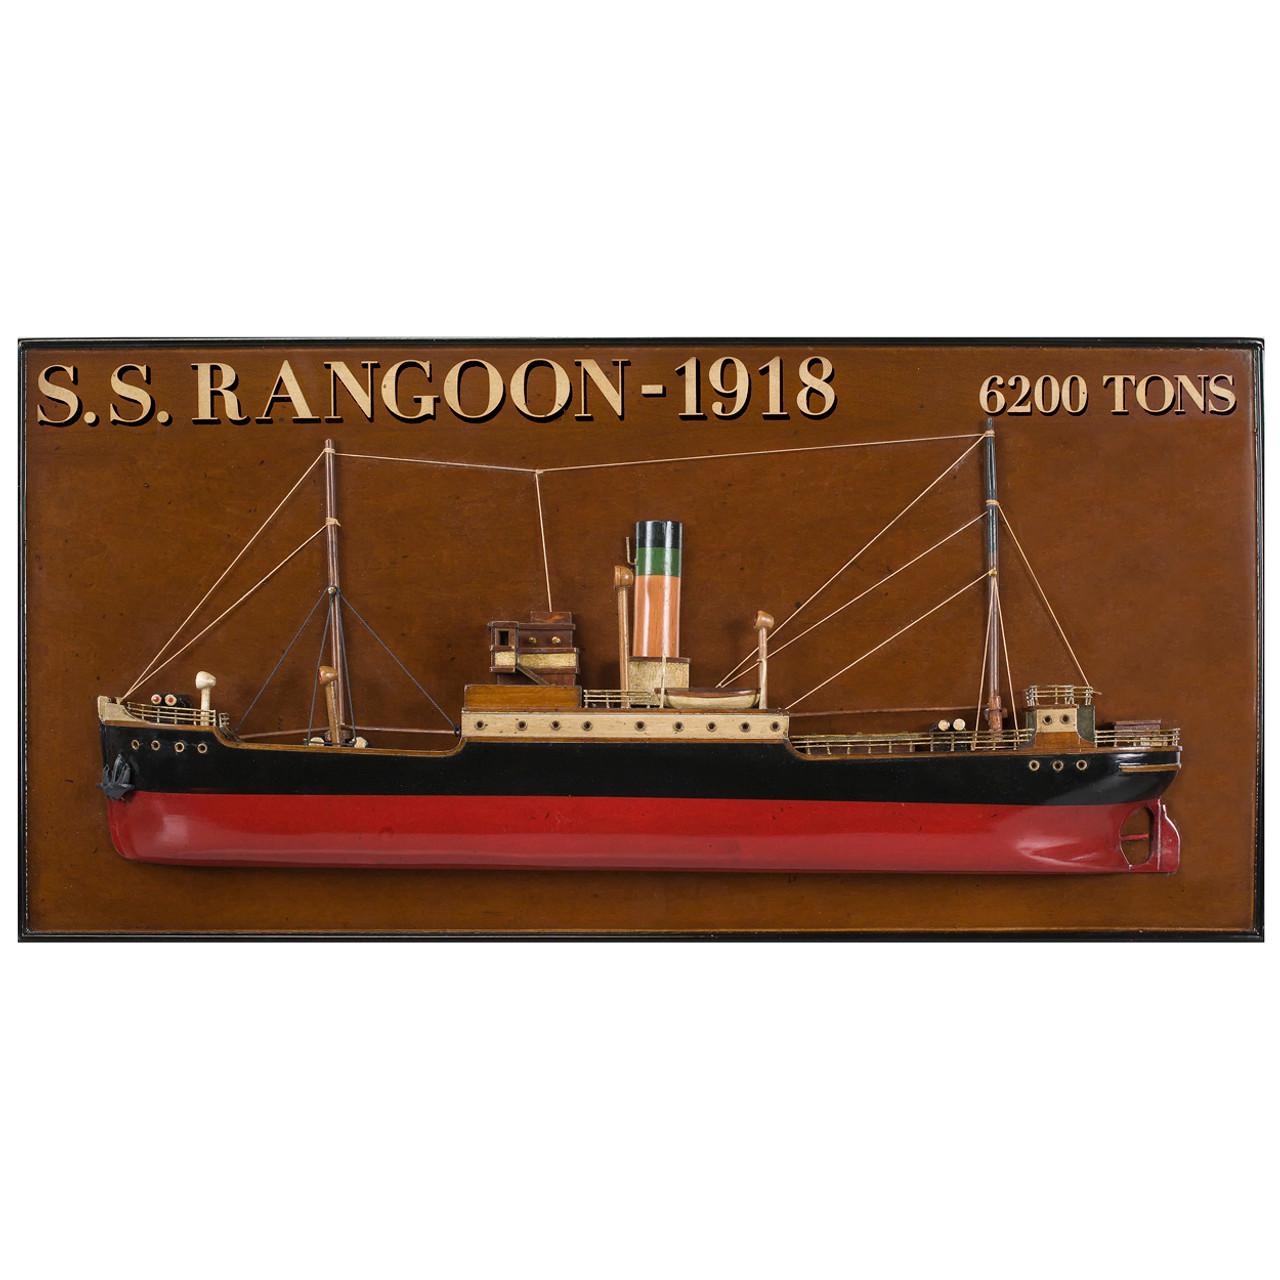 Rangoon 1918 Tramp Steamer Wooden Half Model